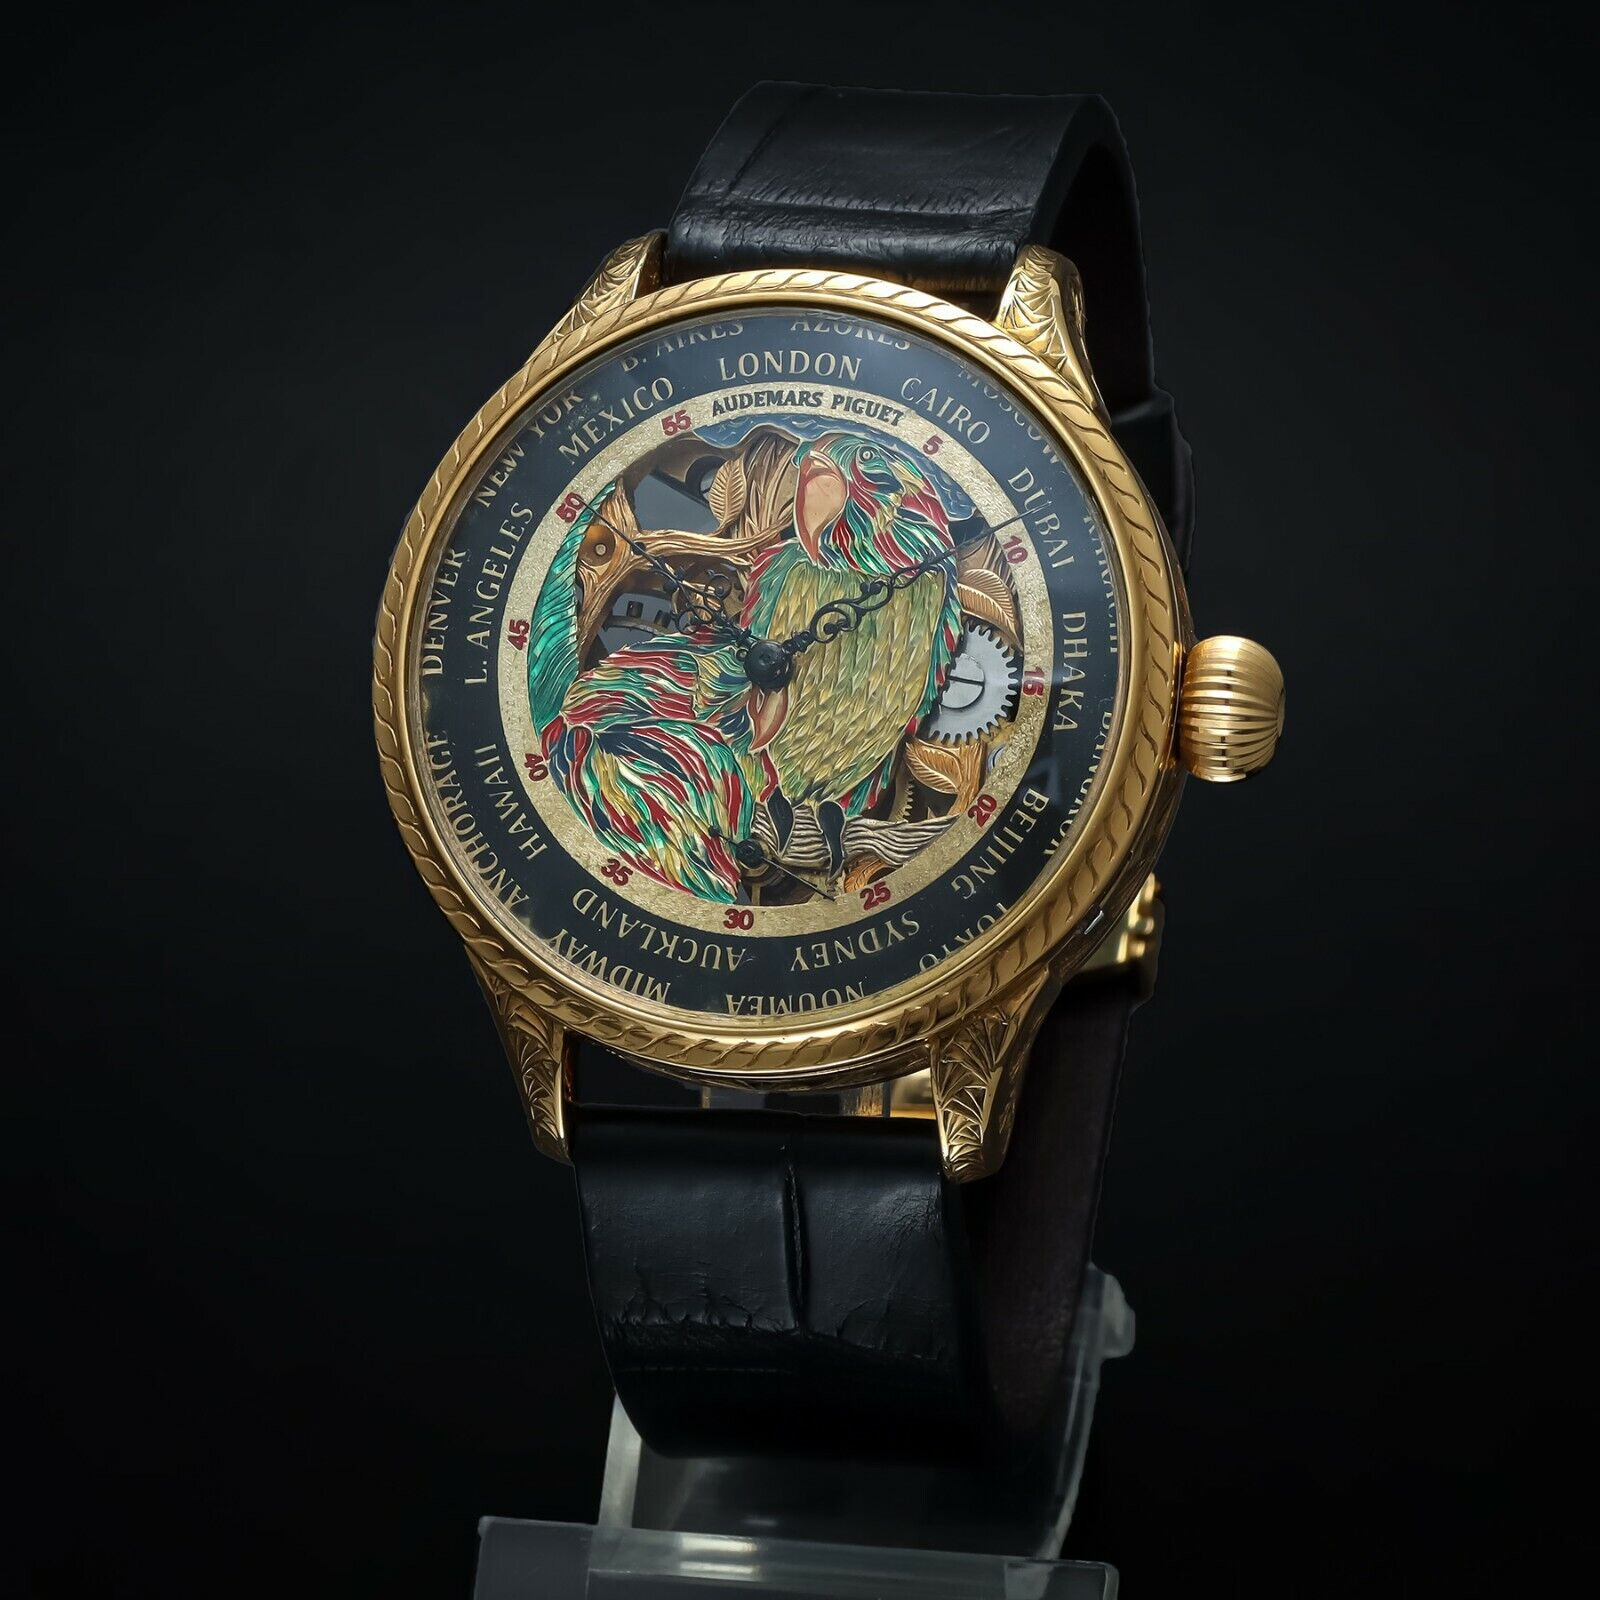 Luxury Audemars Piguet Skeleton Mens Wristwatch based on Vintage Movement - watch picture 1